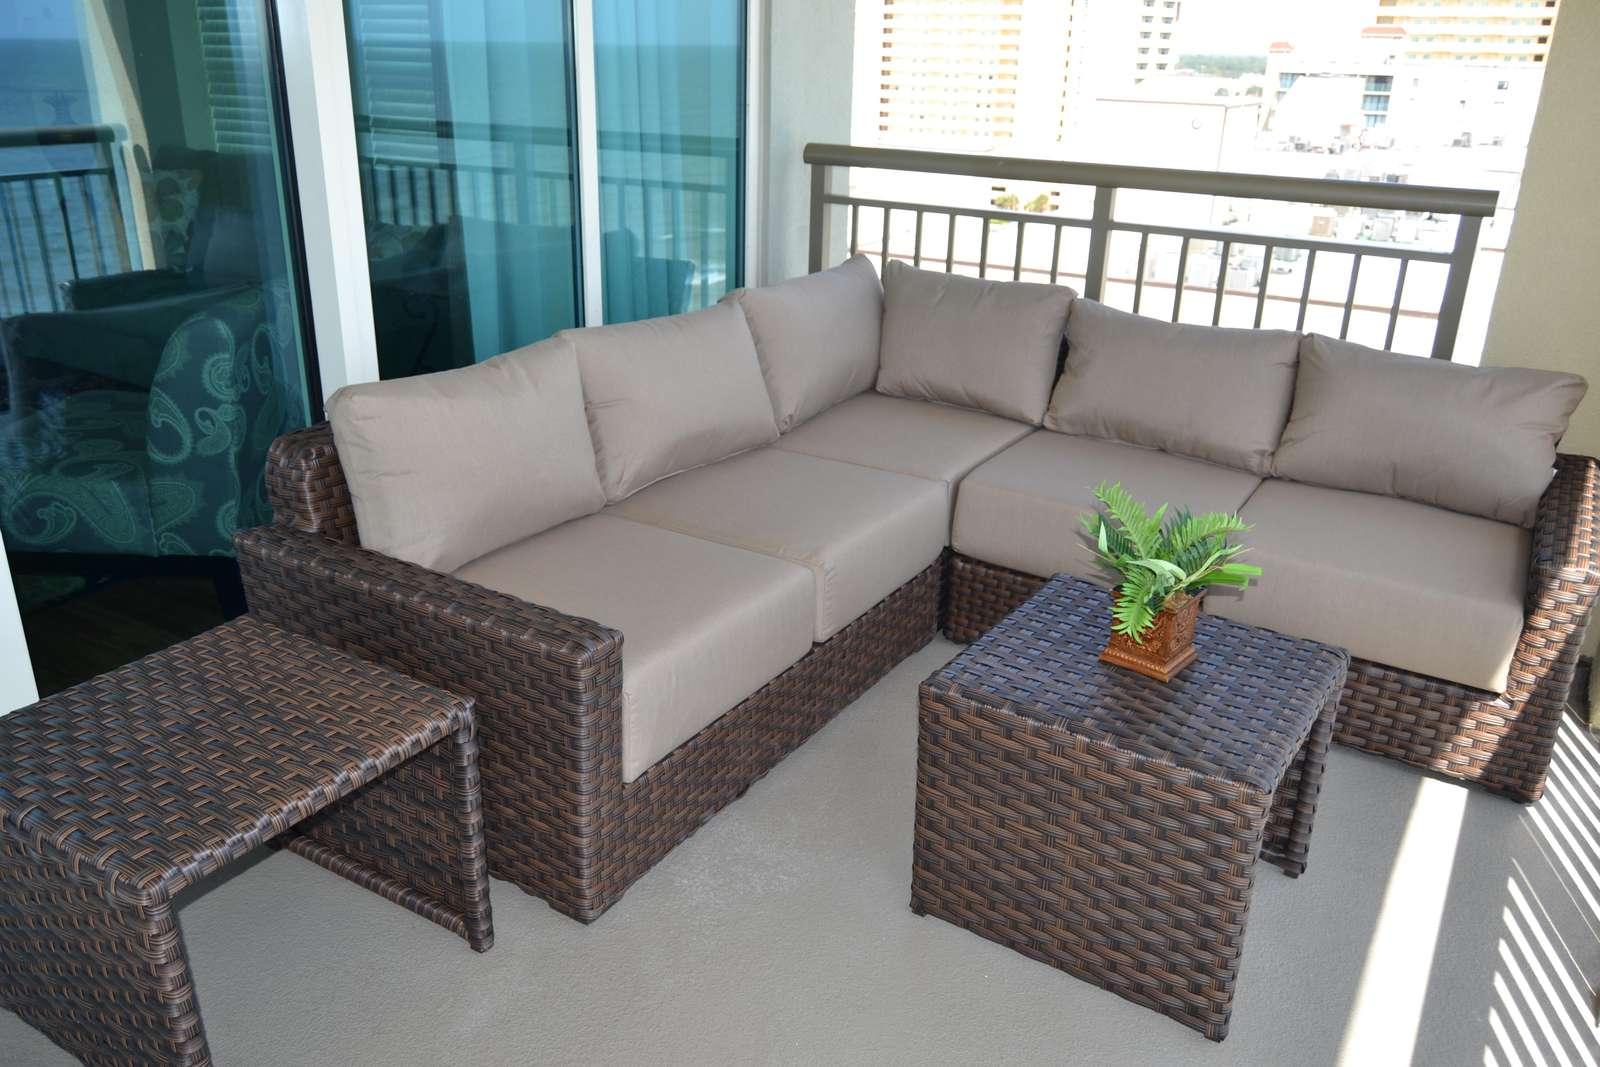 Upgraded patio furnishings